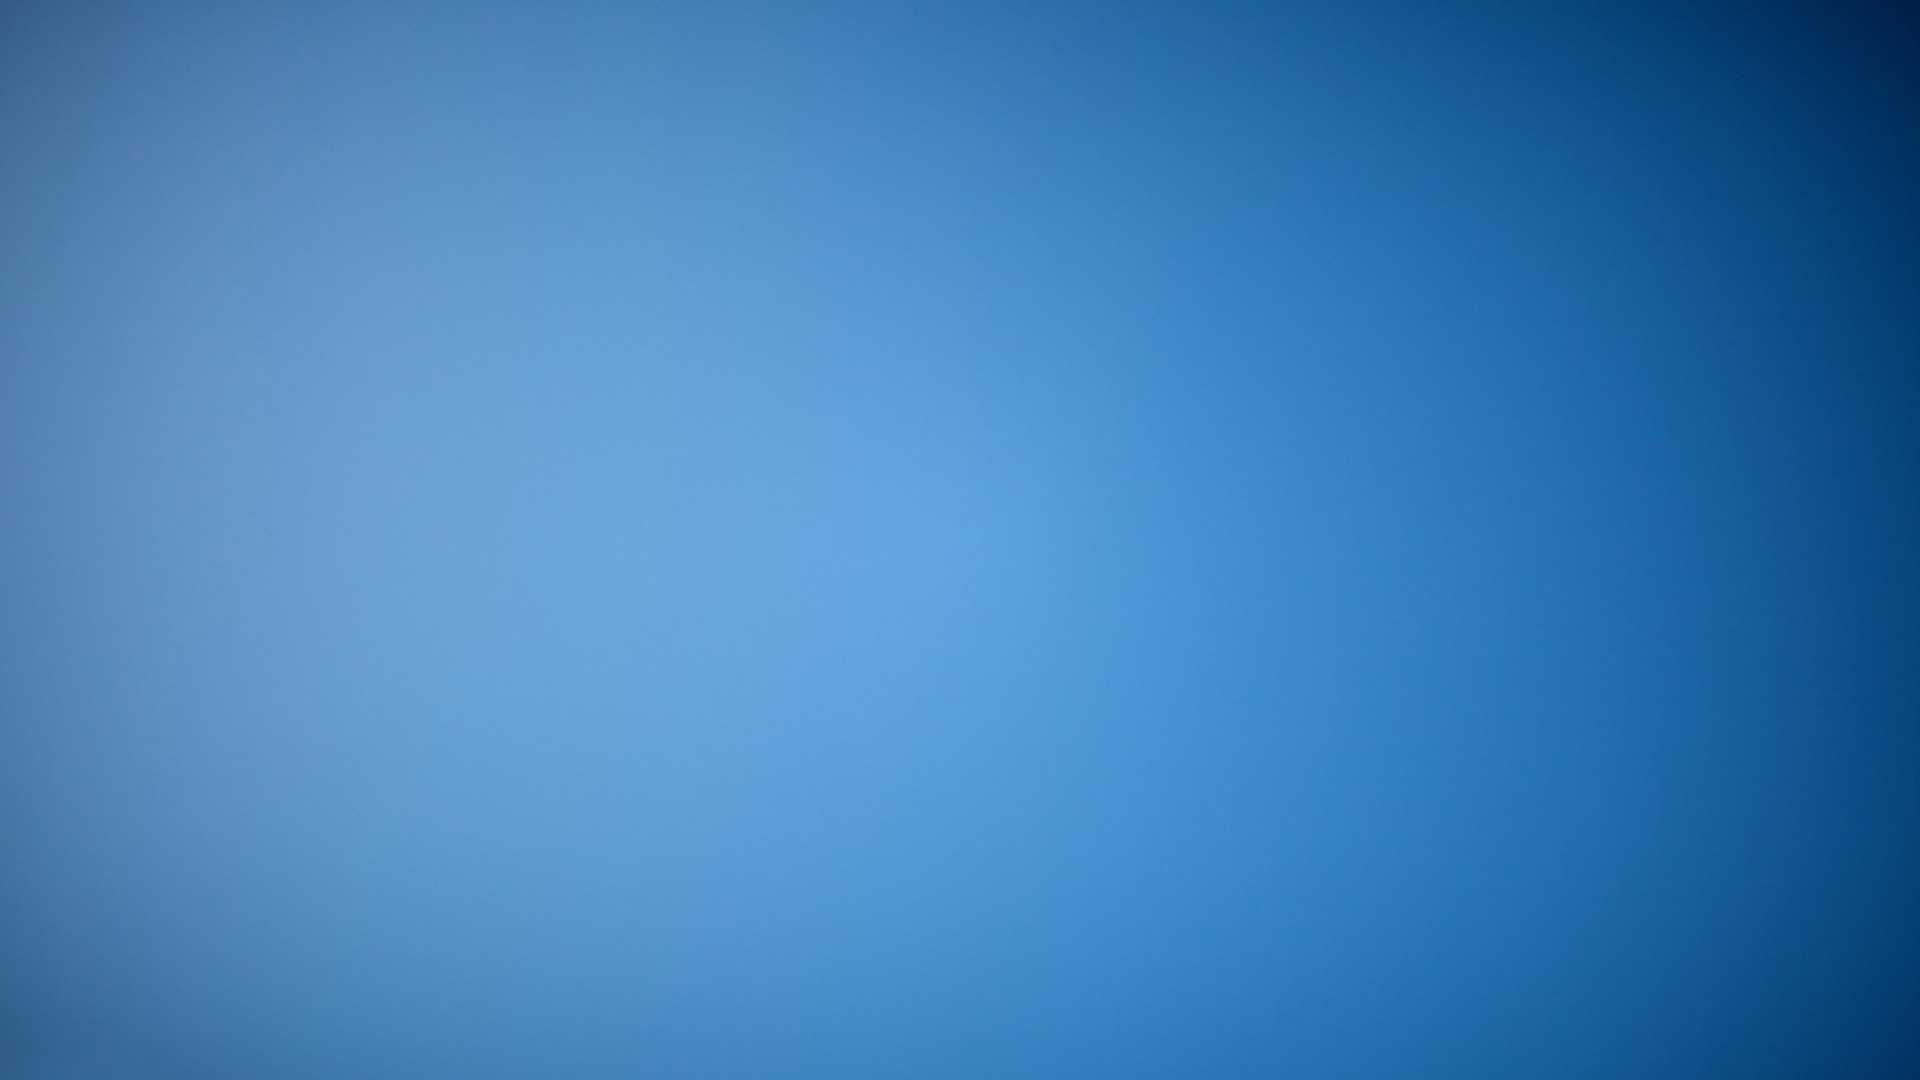 Res: 1920x1080, blue-gradient-wallpaper-399-448-hd-wallpapers